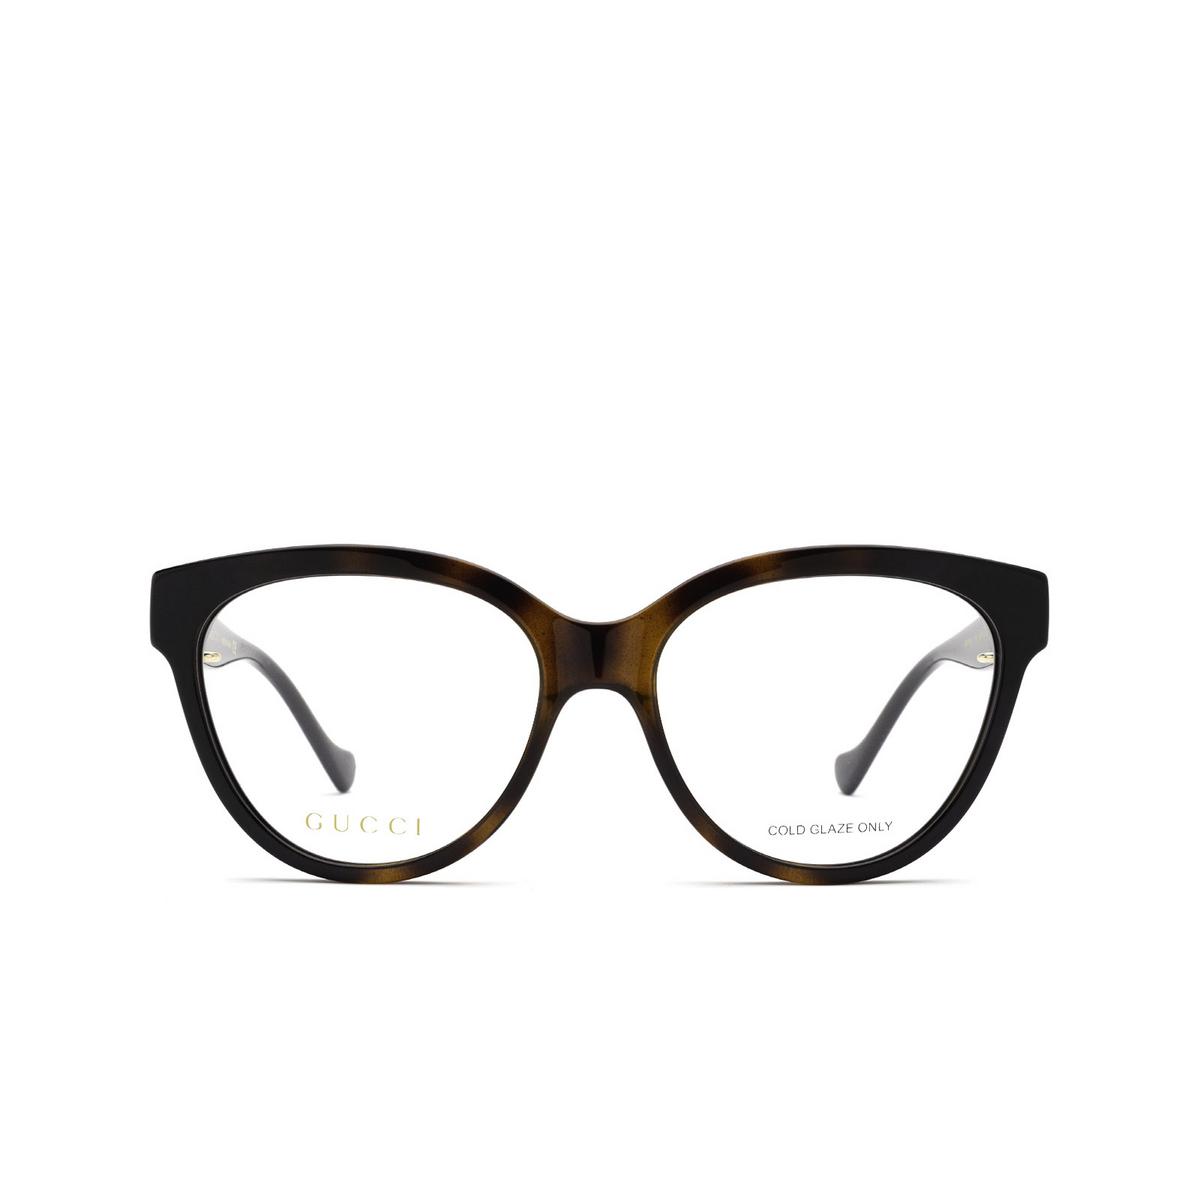 Gucci® Oval Eyeglasses: GG1024O color Black & Havana 005 - front view.